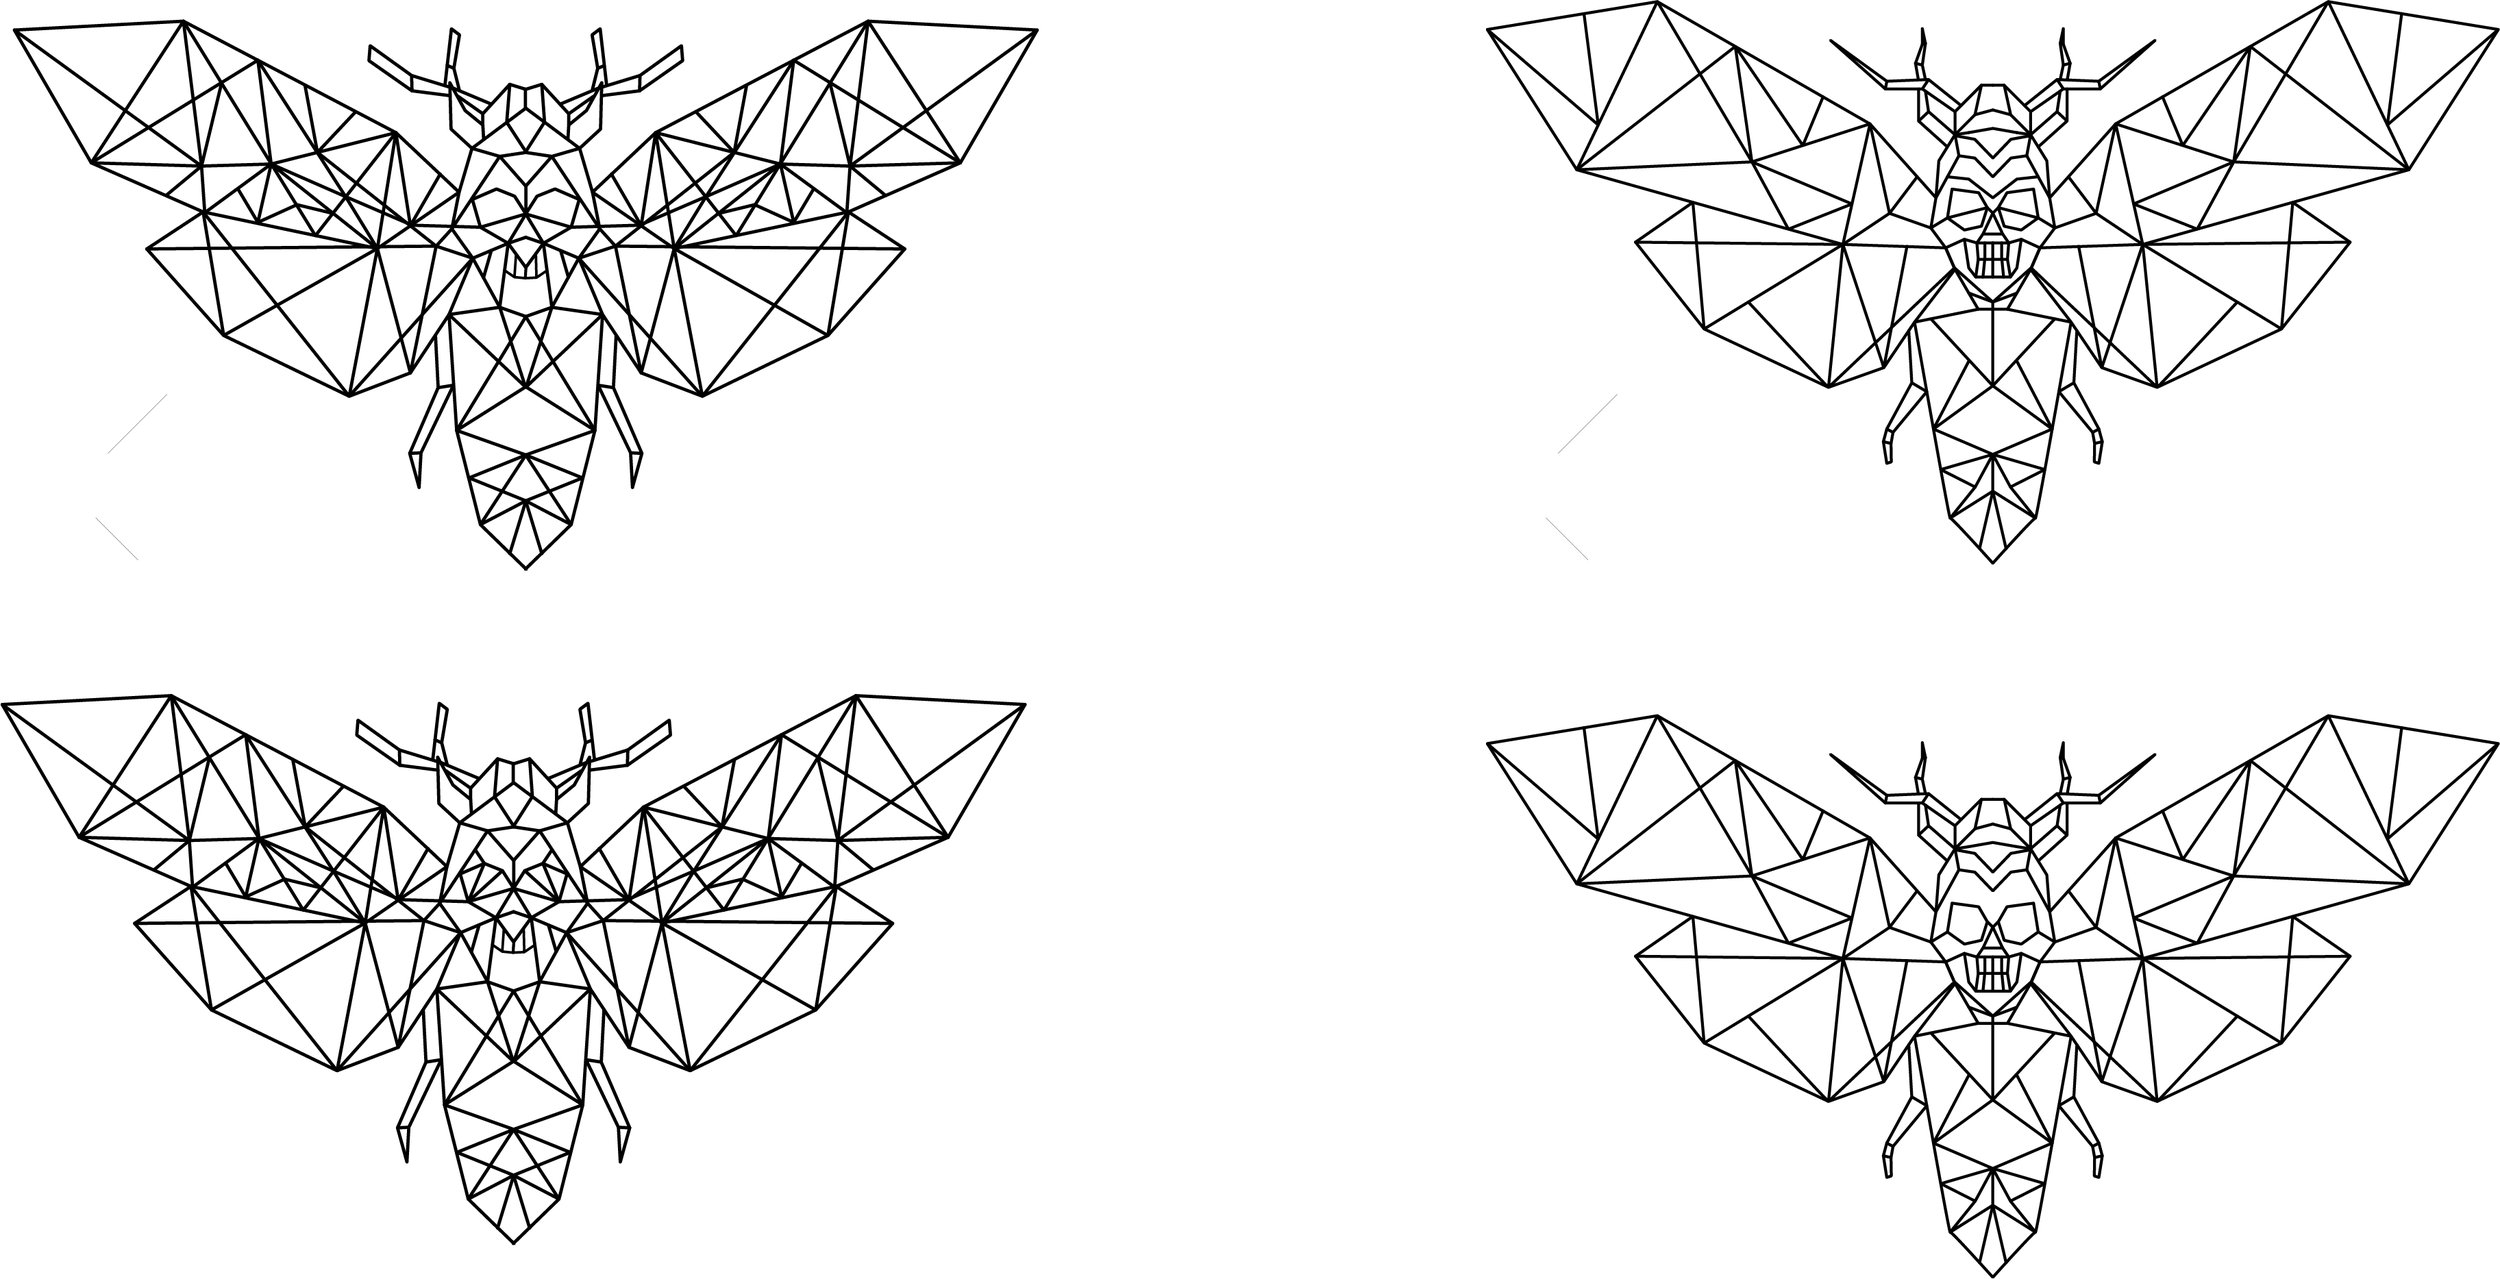 moth_final.png